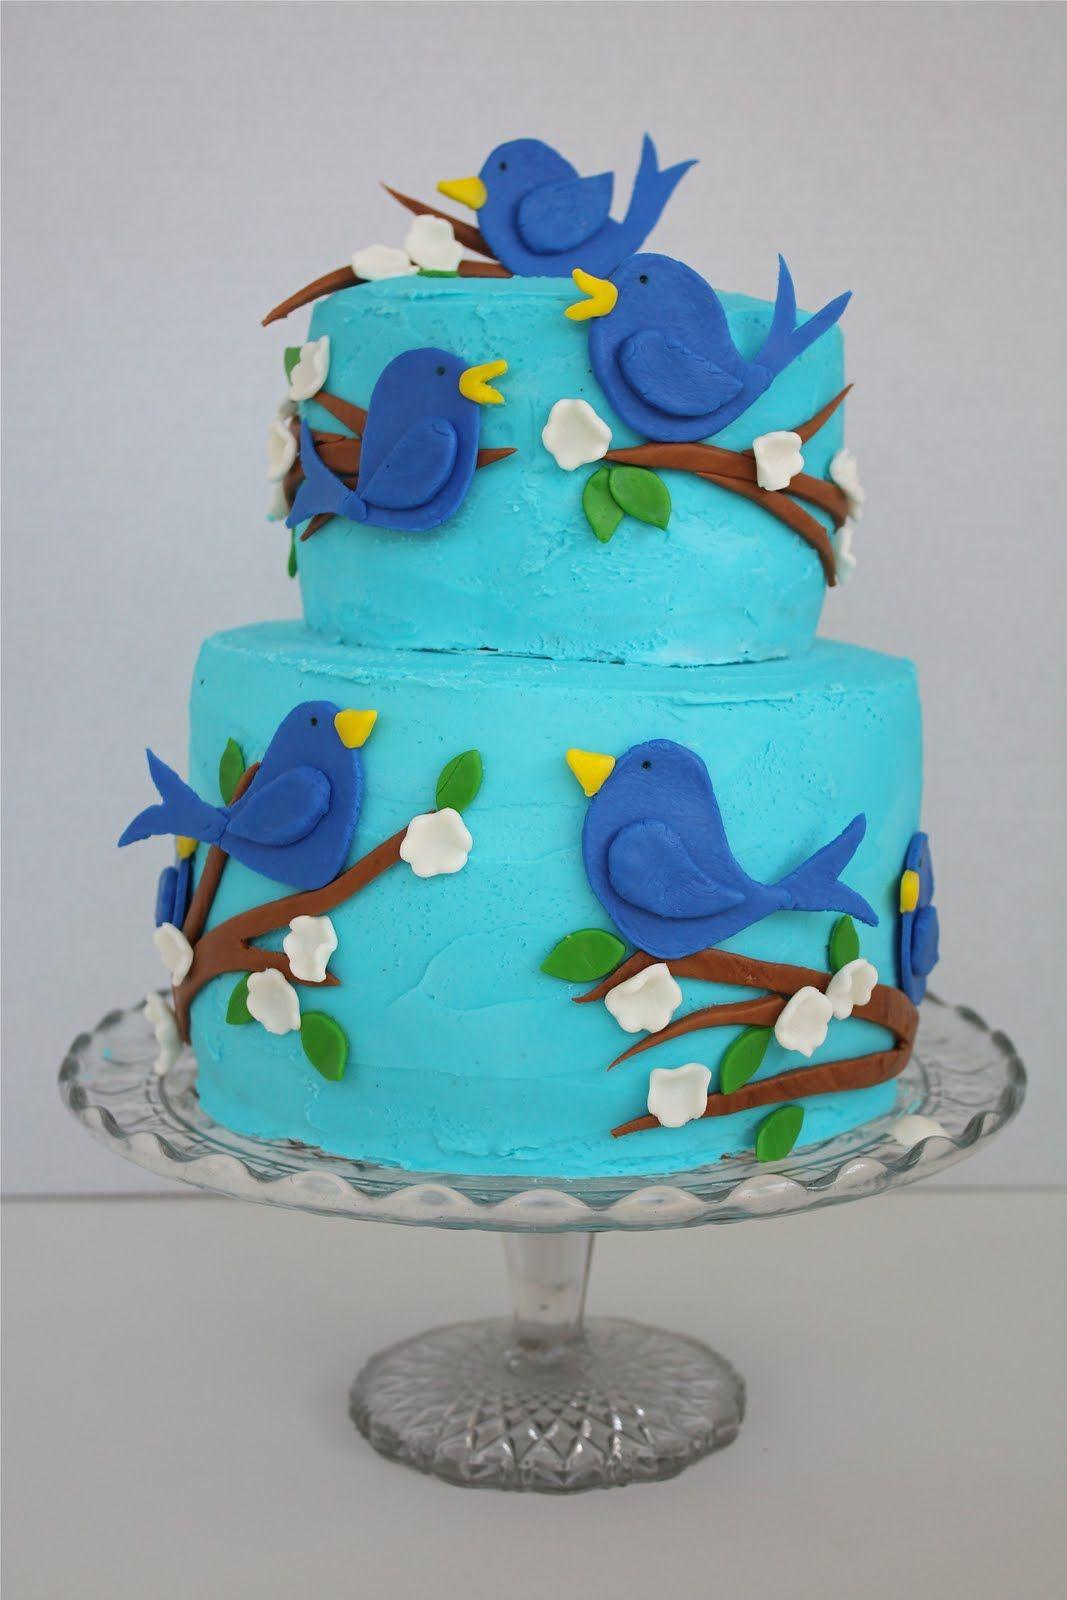 Surprising 23 Inspiration Image Of Bird Birthday Cake Bird Birthday Cake Personalised Birthday Cards Cominlily Jamesorg